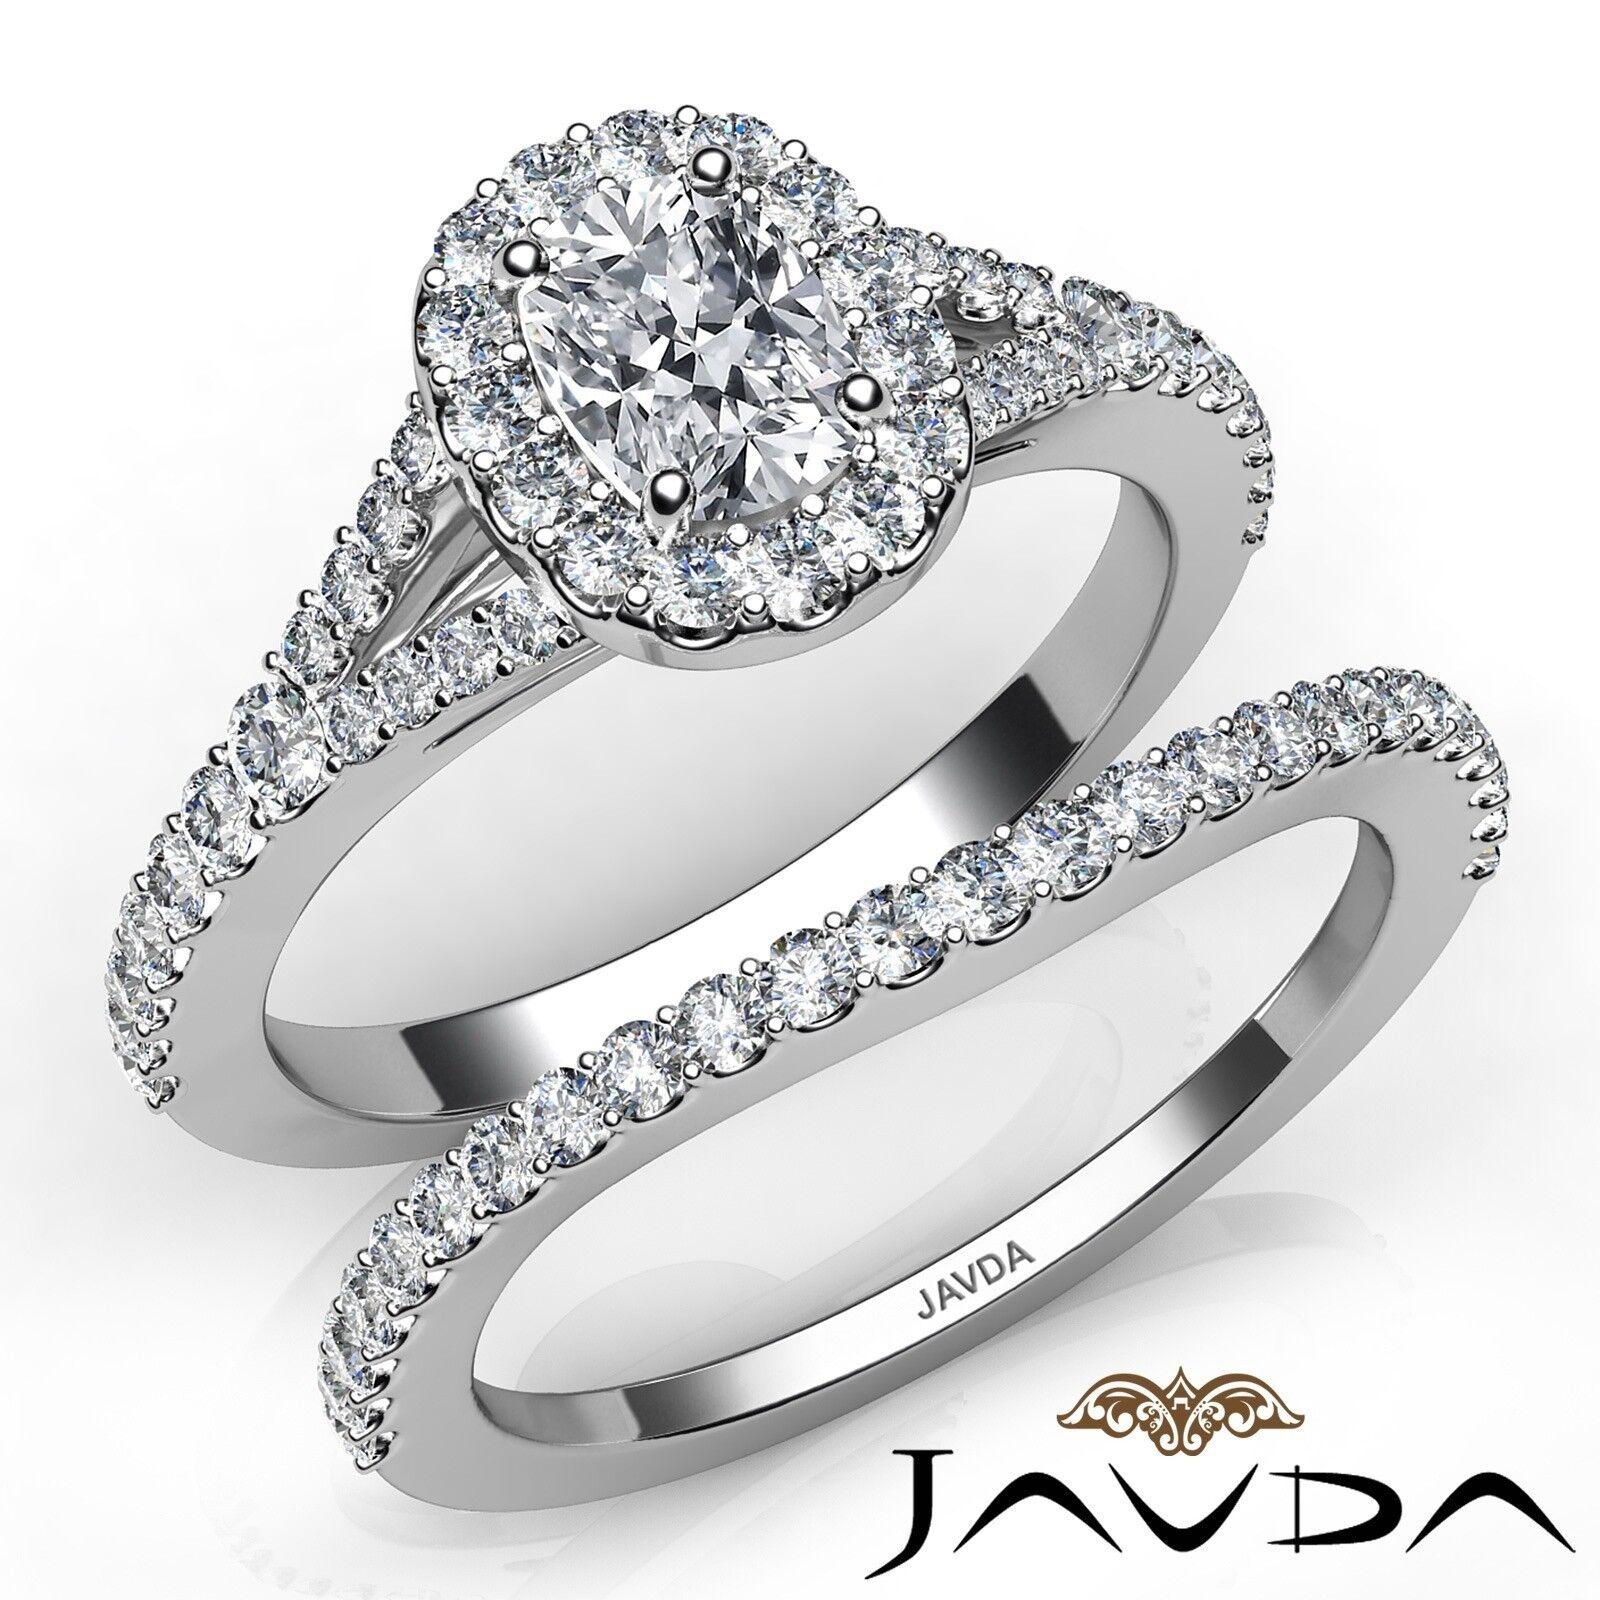 1.55ctw U Halo Pave Bridal Cushion Diamond Engagement Ring GIA E-VS2 White Gold